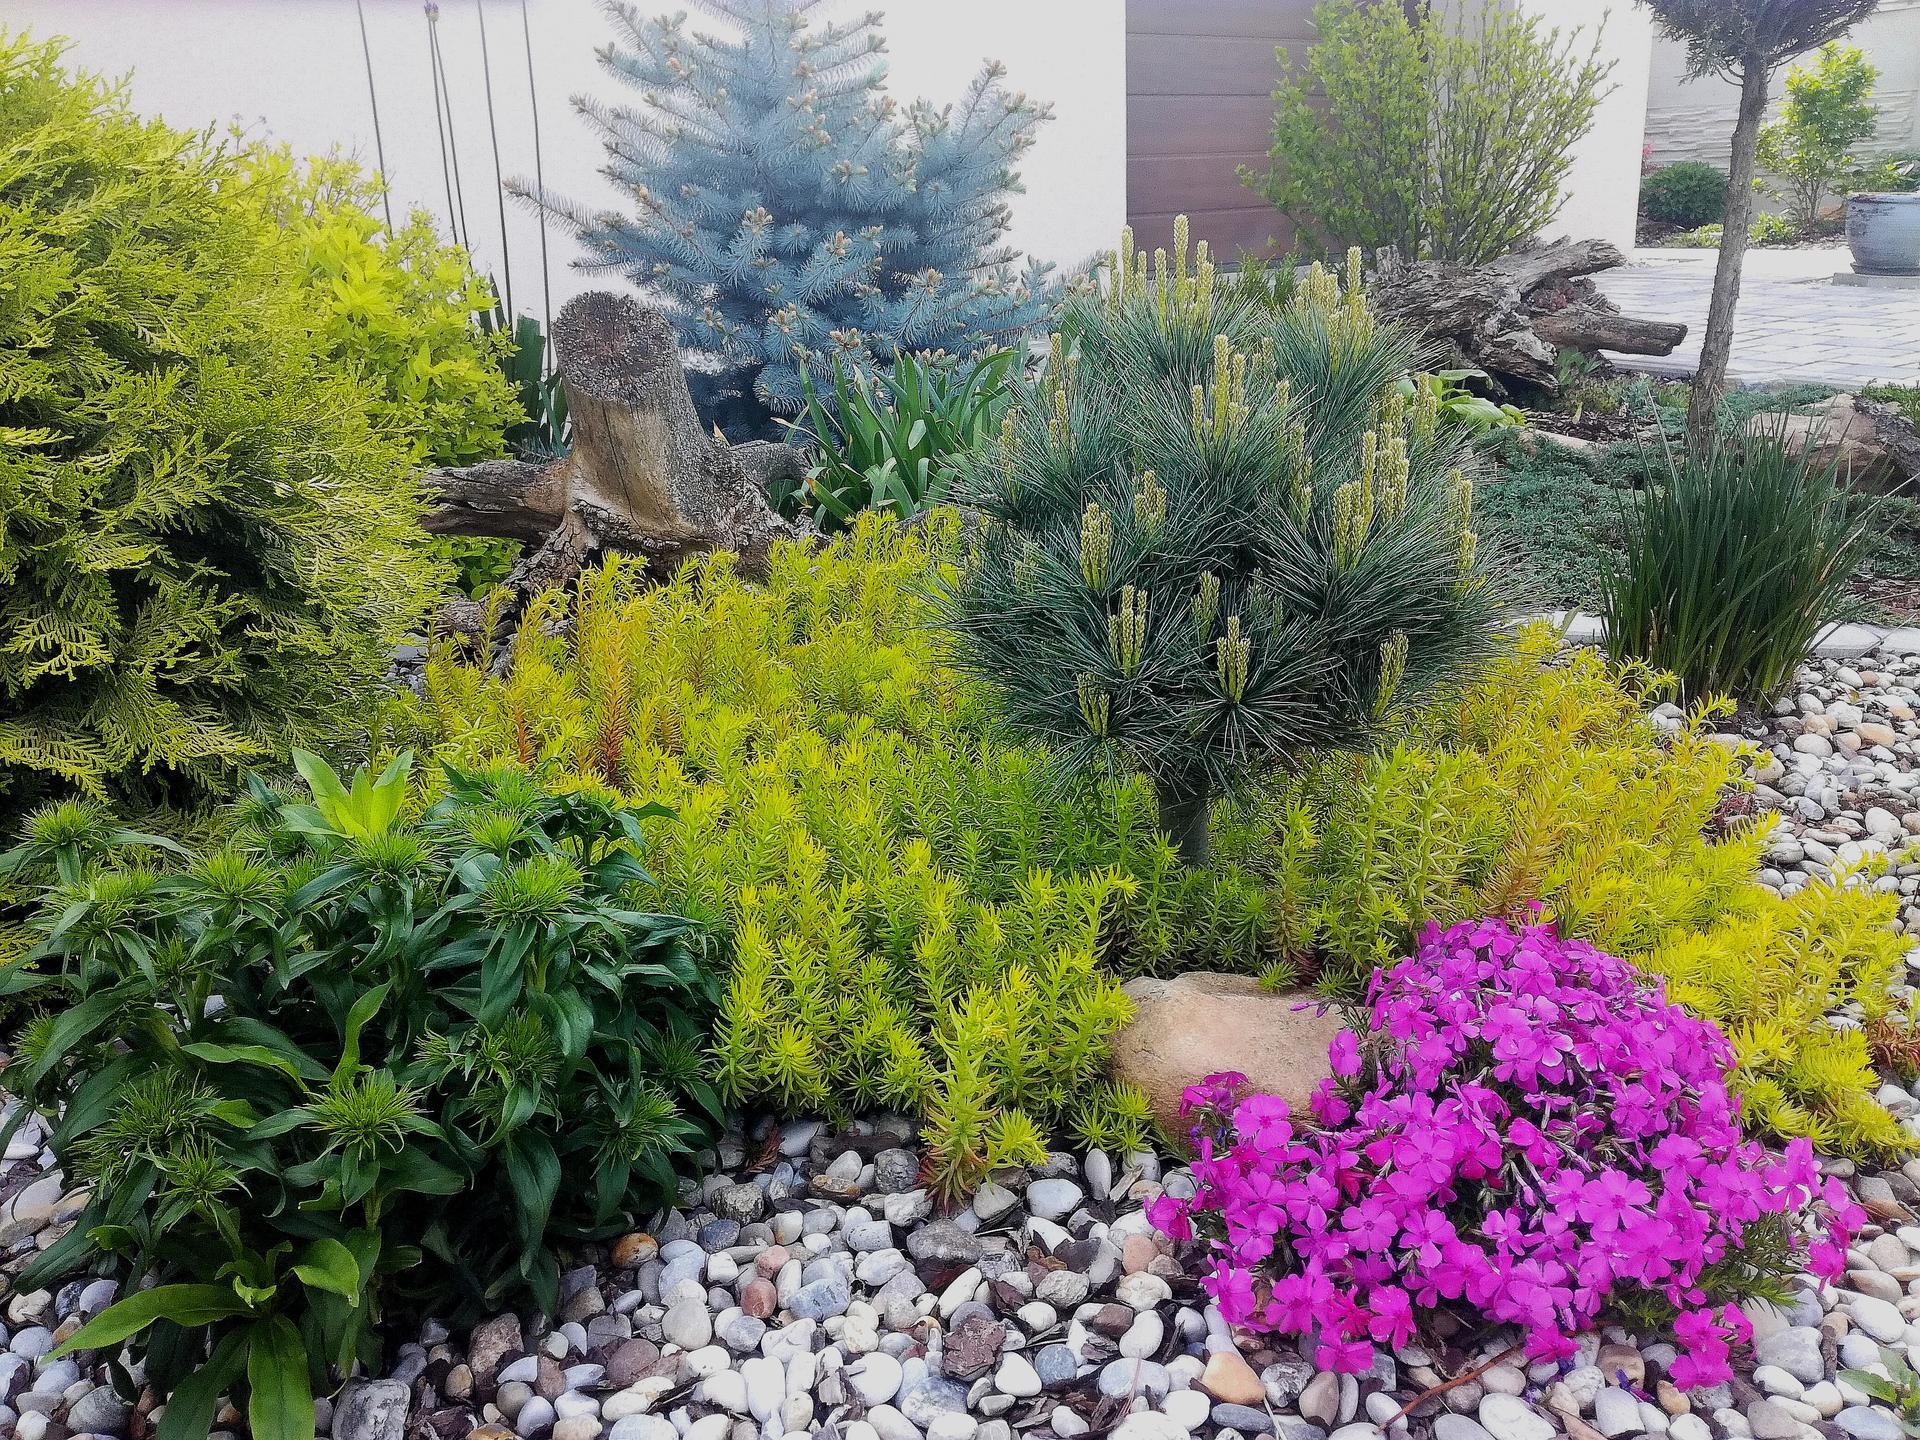 Zahrada 2021 🌲 - Obrázek č. 70